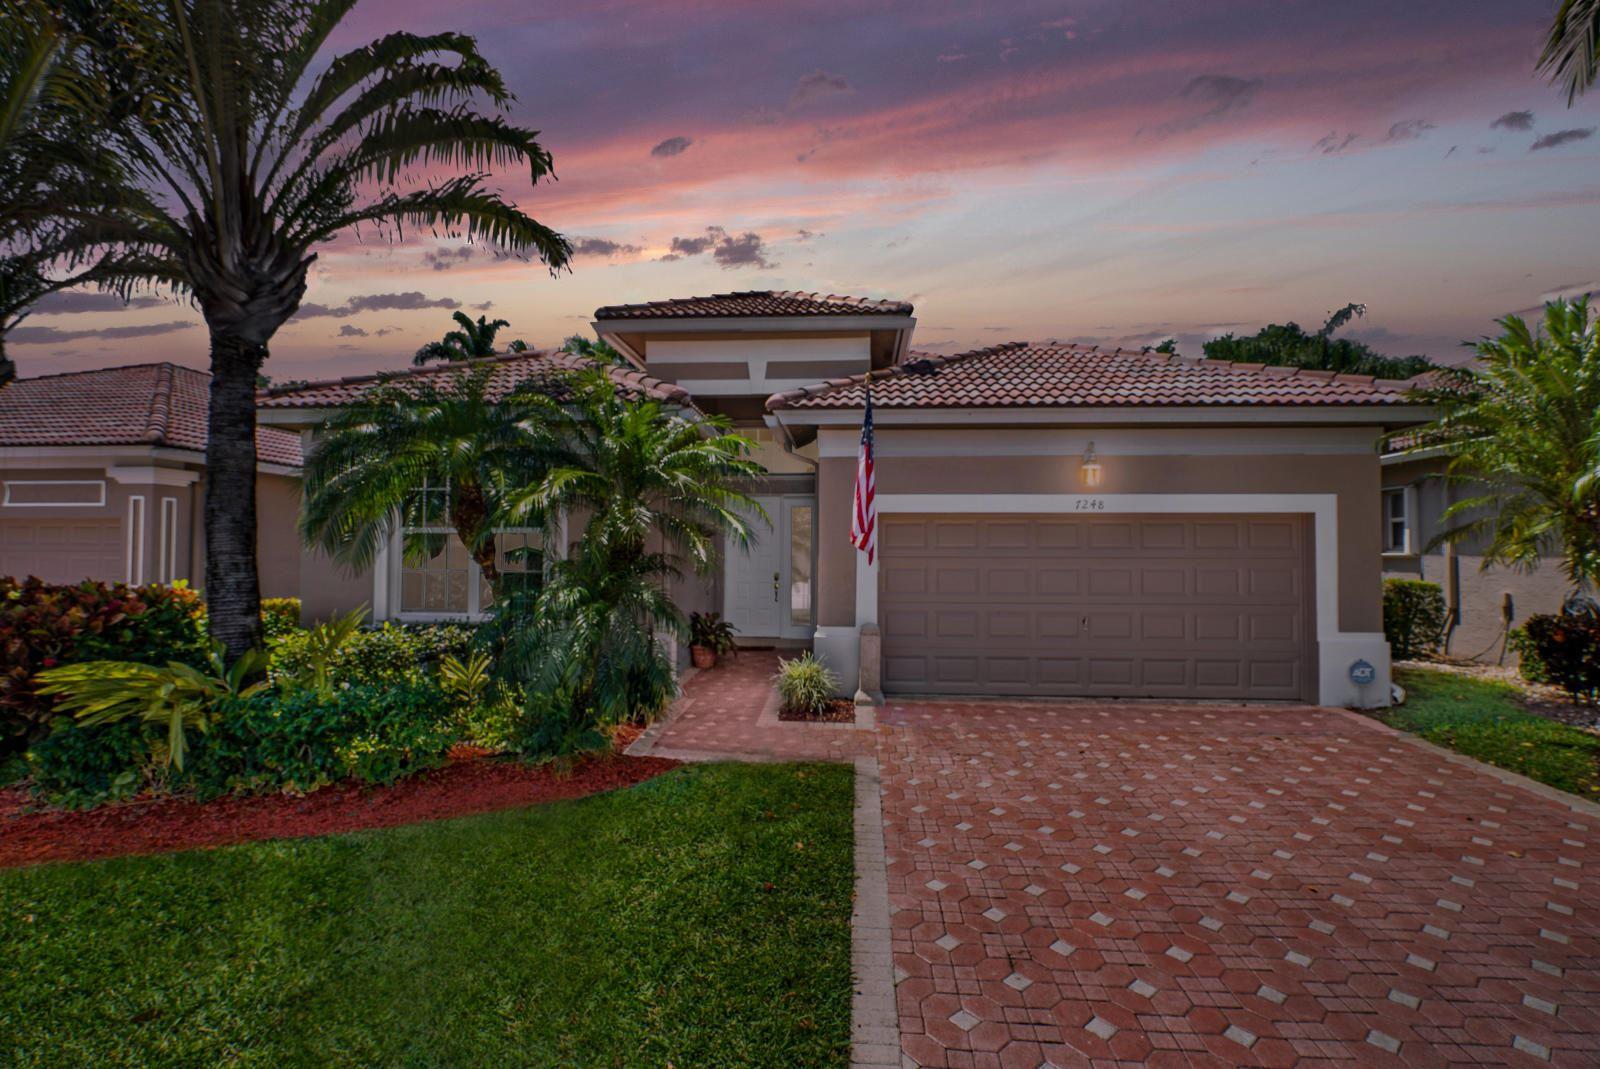 7248 Southport Drive, Boynton Beach, FL 33472 - MLS#: RX-10709816